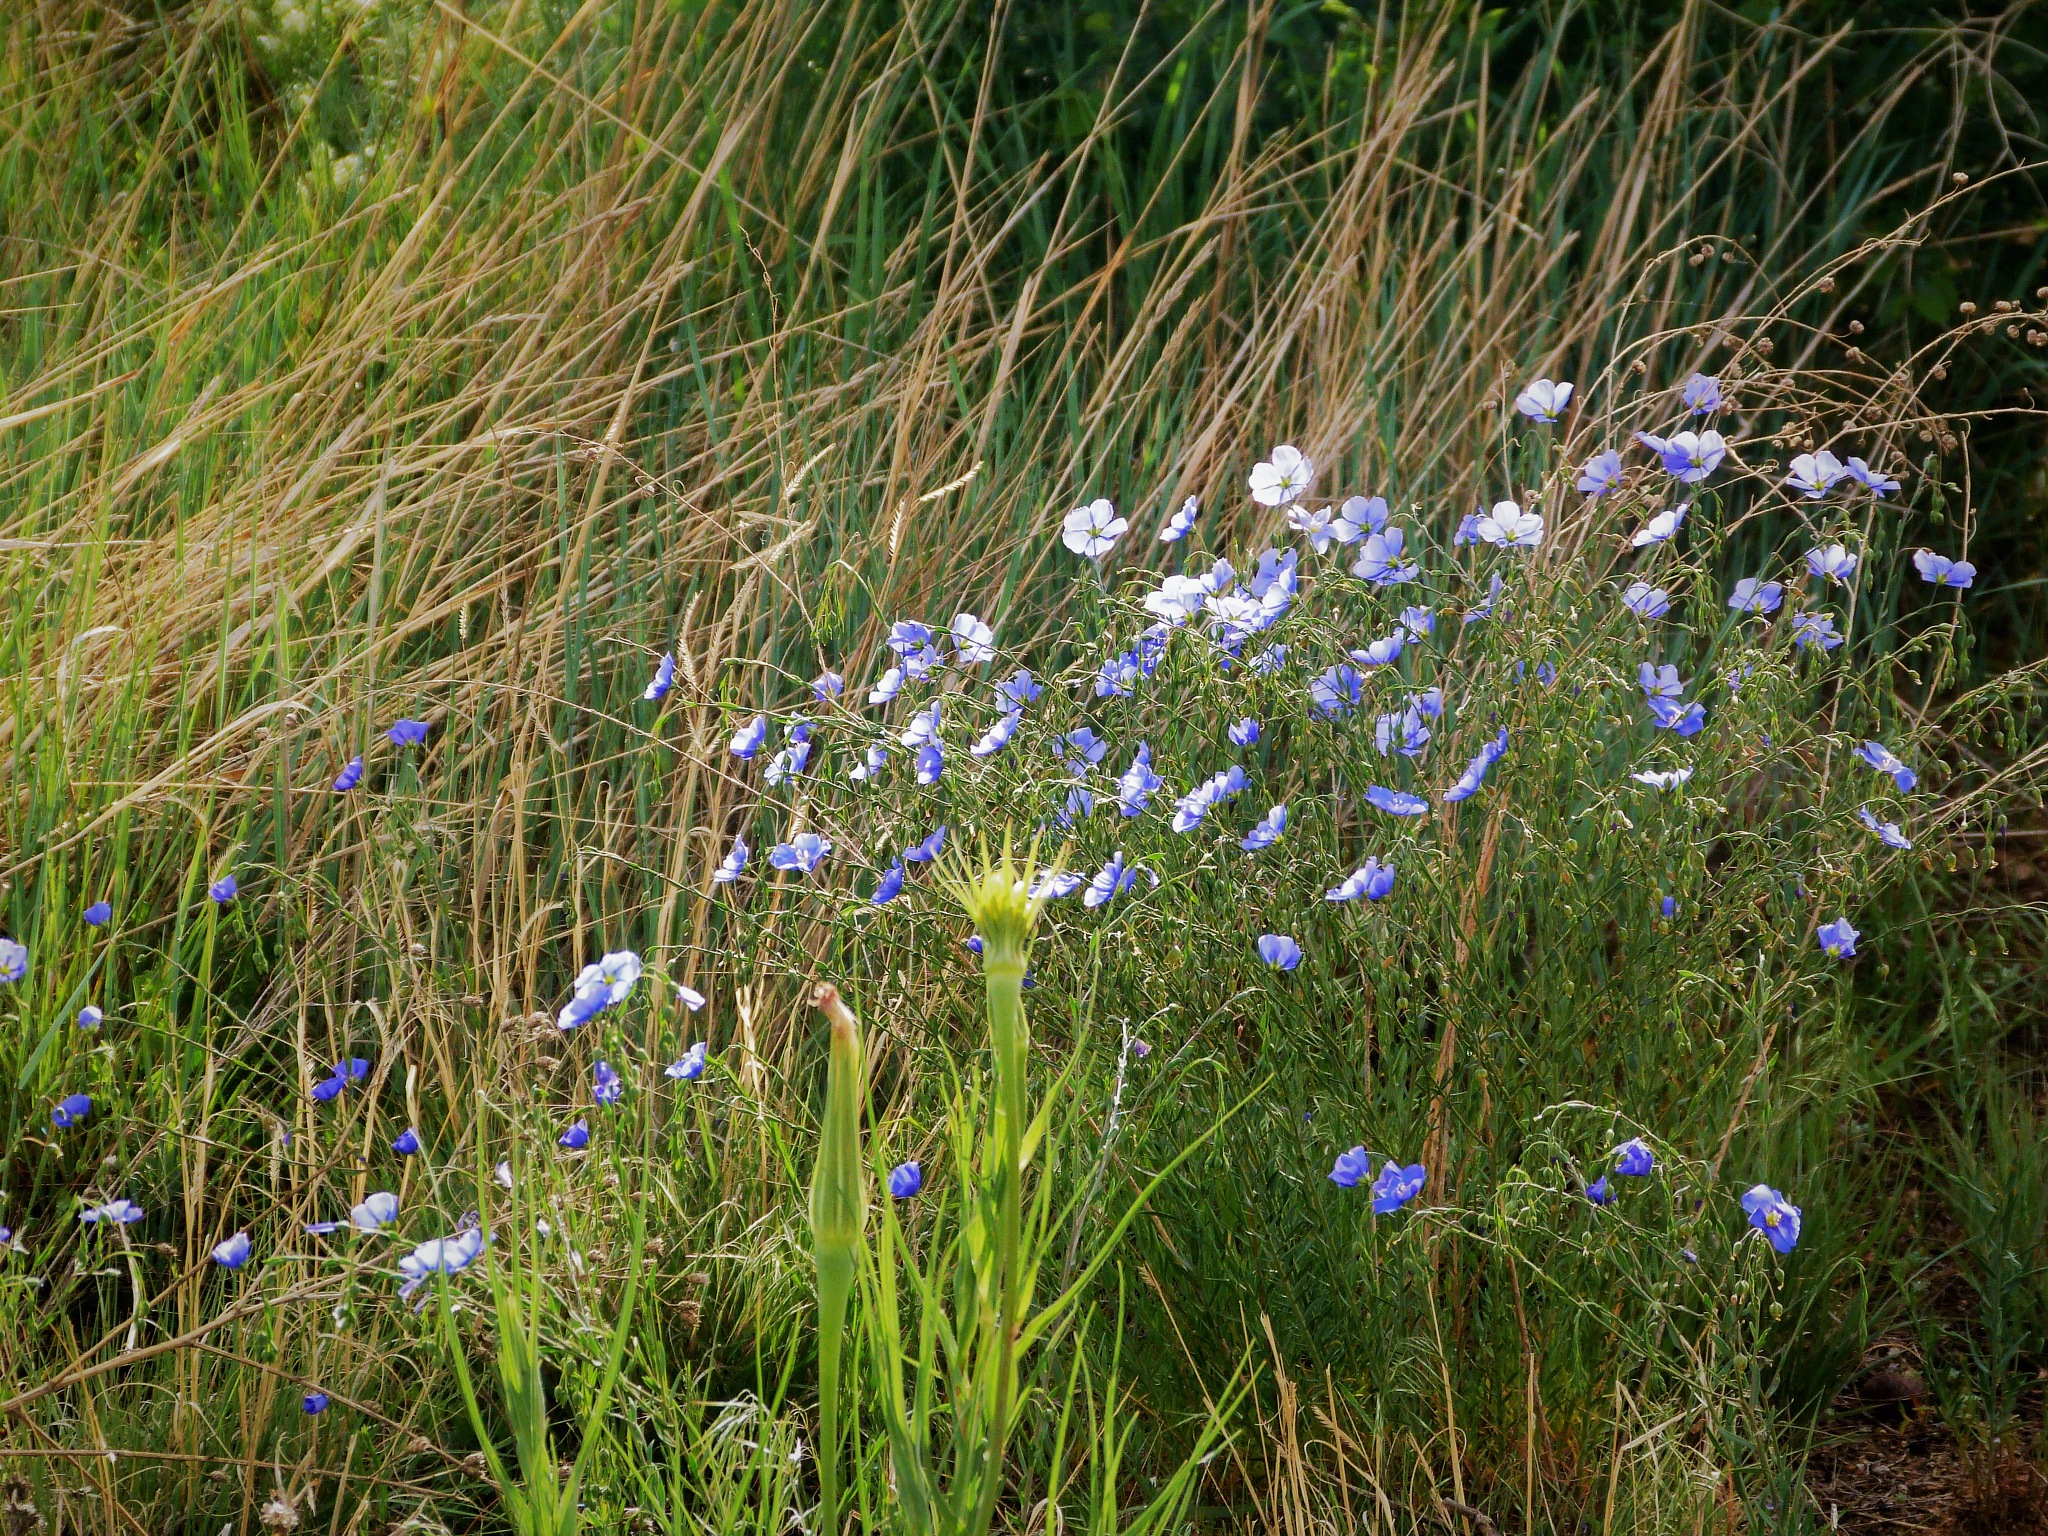 Wildflowers 2 by maria.telegdy